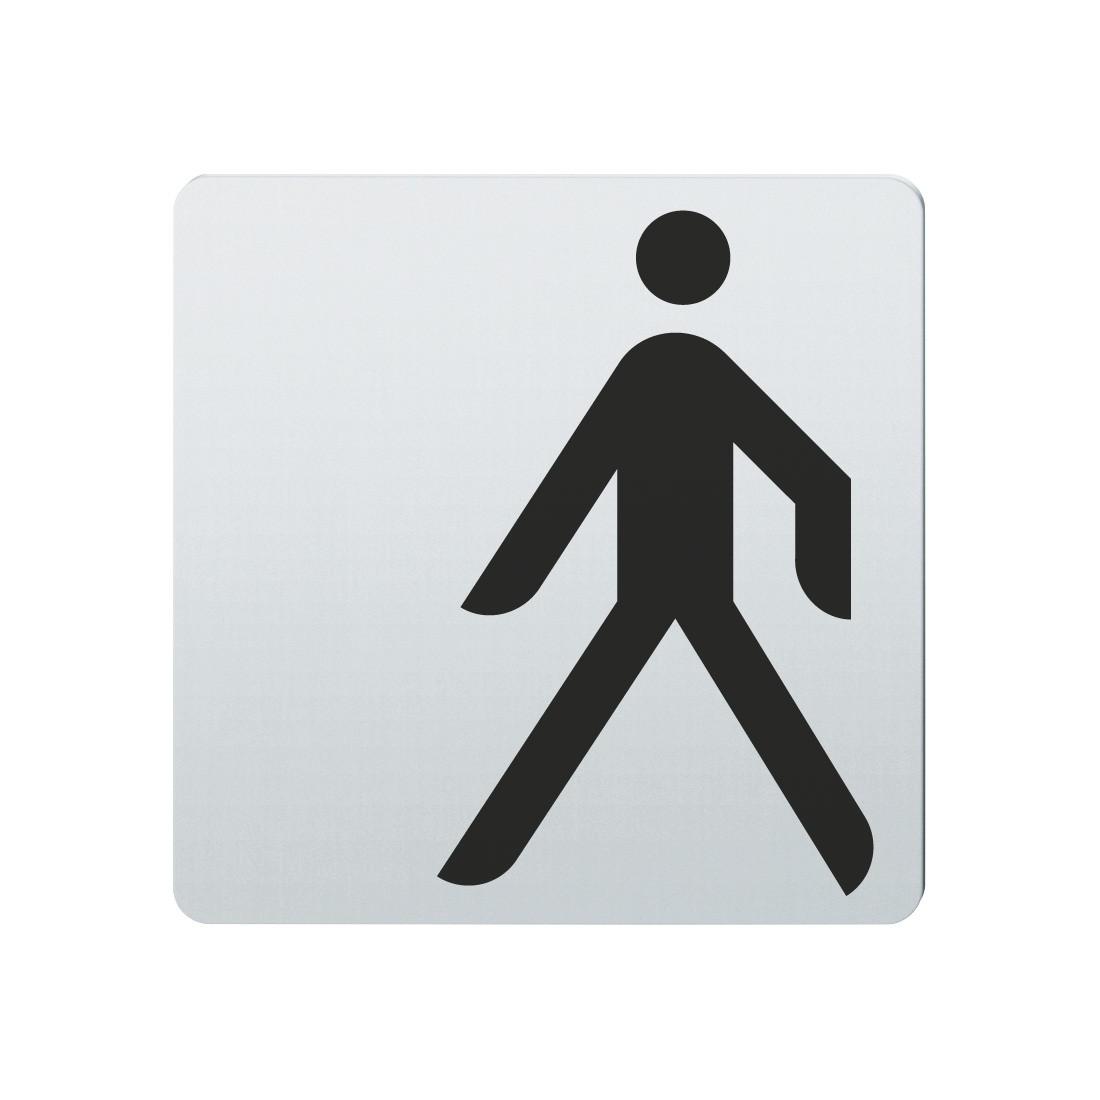 FSB Hinweiszeichen Fussgaenger Lasergraviert Edelstahl fein matt (0 36 4059 00010 6204)